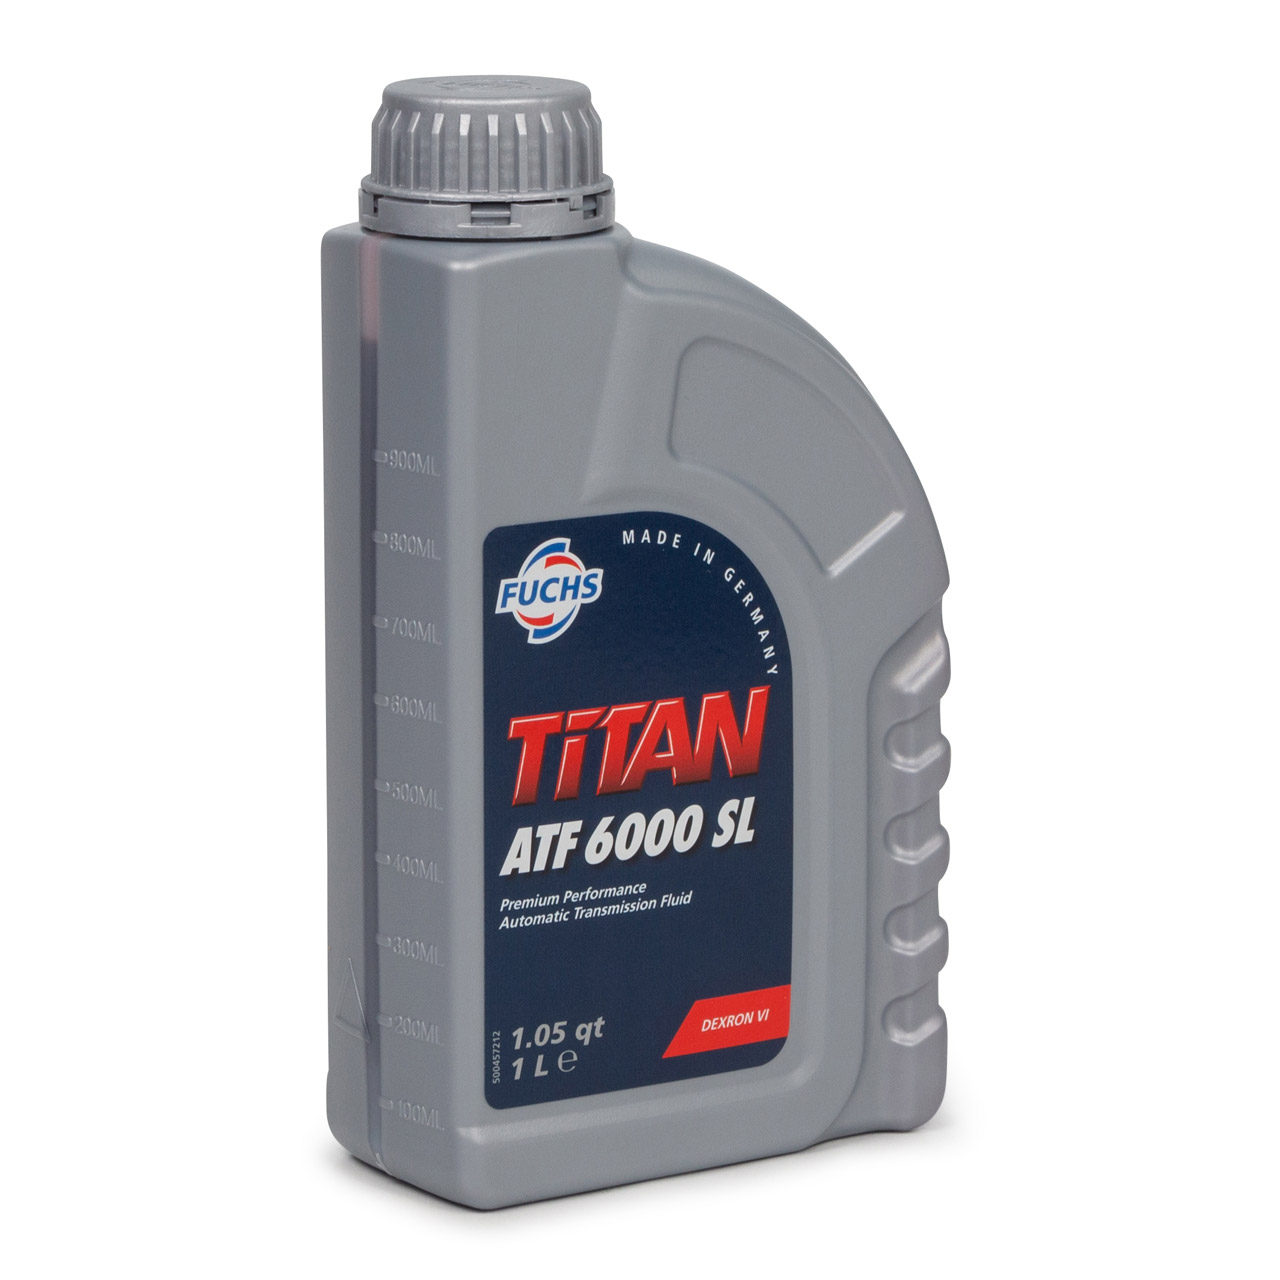 FUCHS Getriebeöl Automatiköl Automatikgetriebeöl TITAN ATF 6000 SL 1 Liter